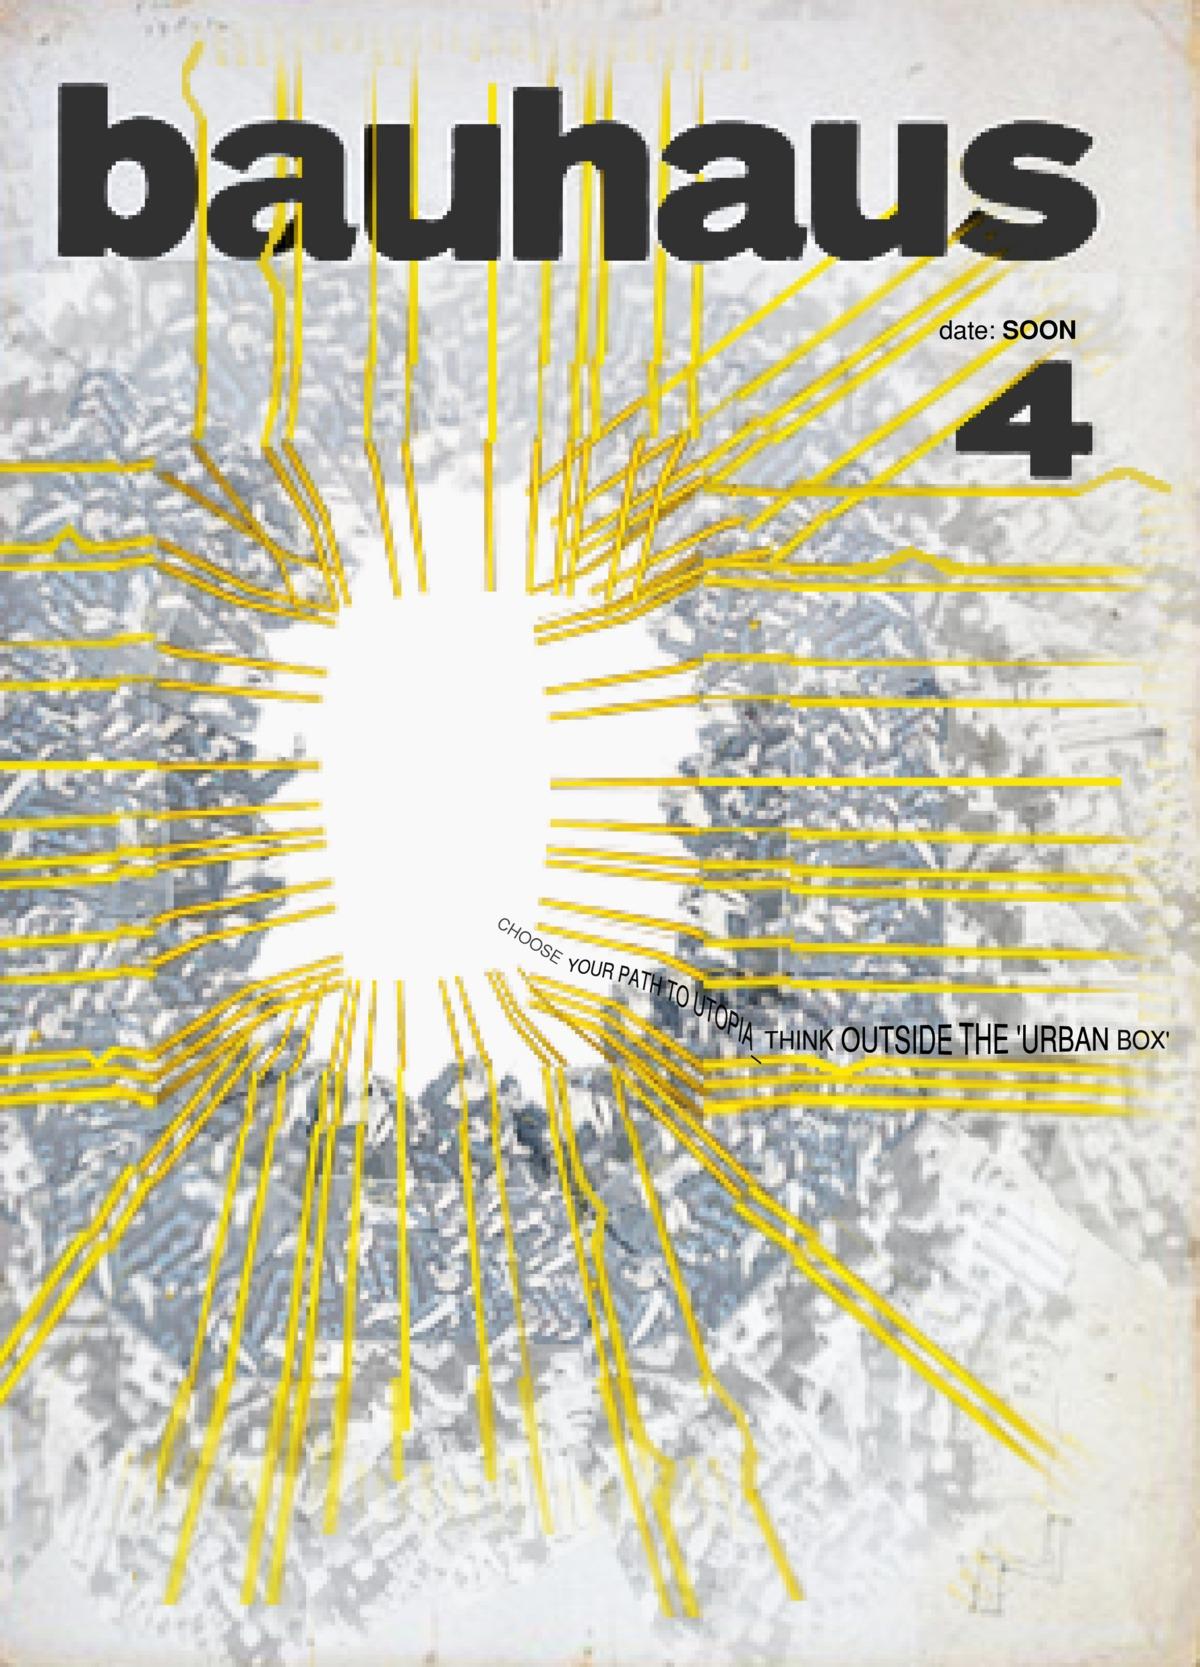 Utopia_periodical cover